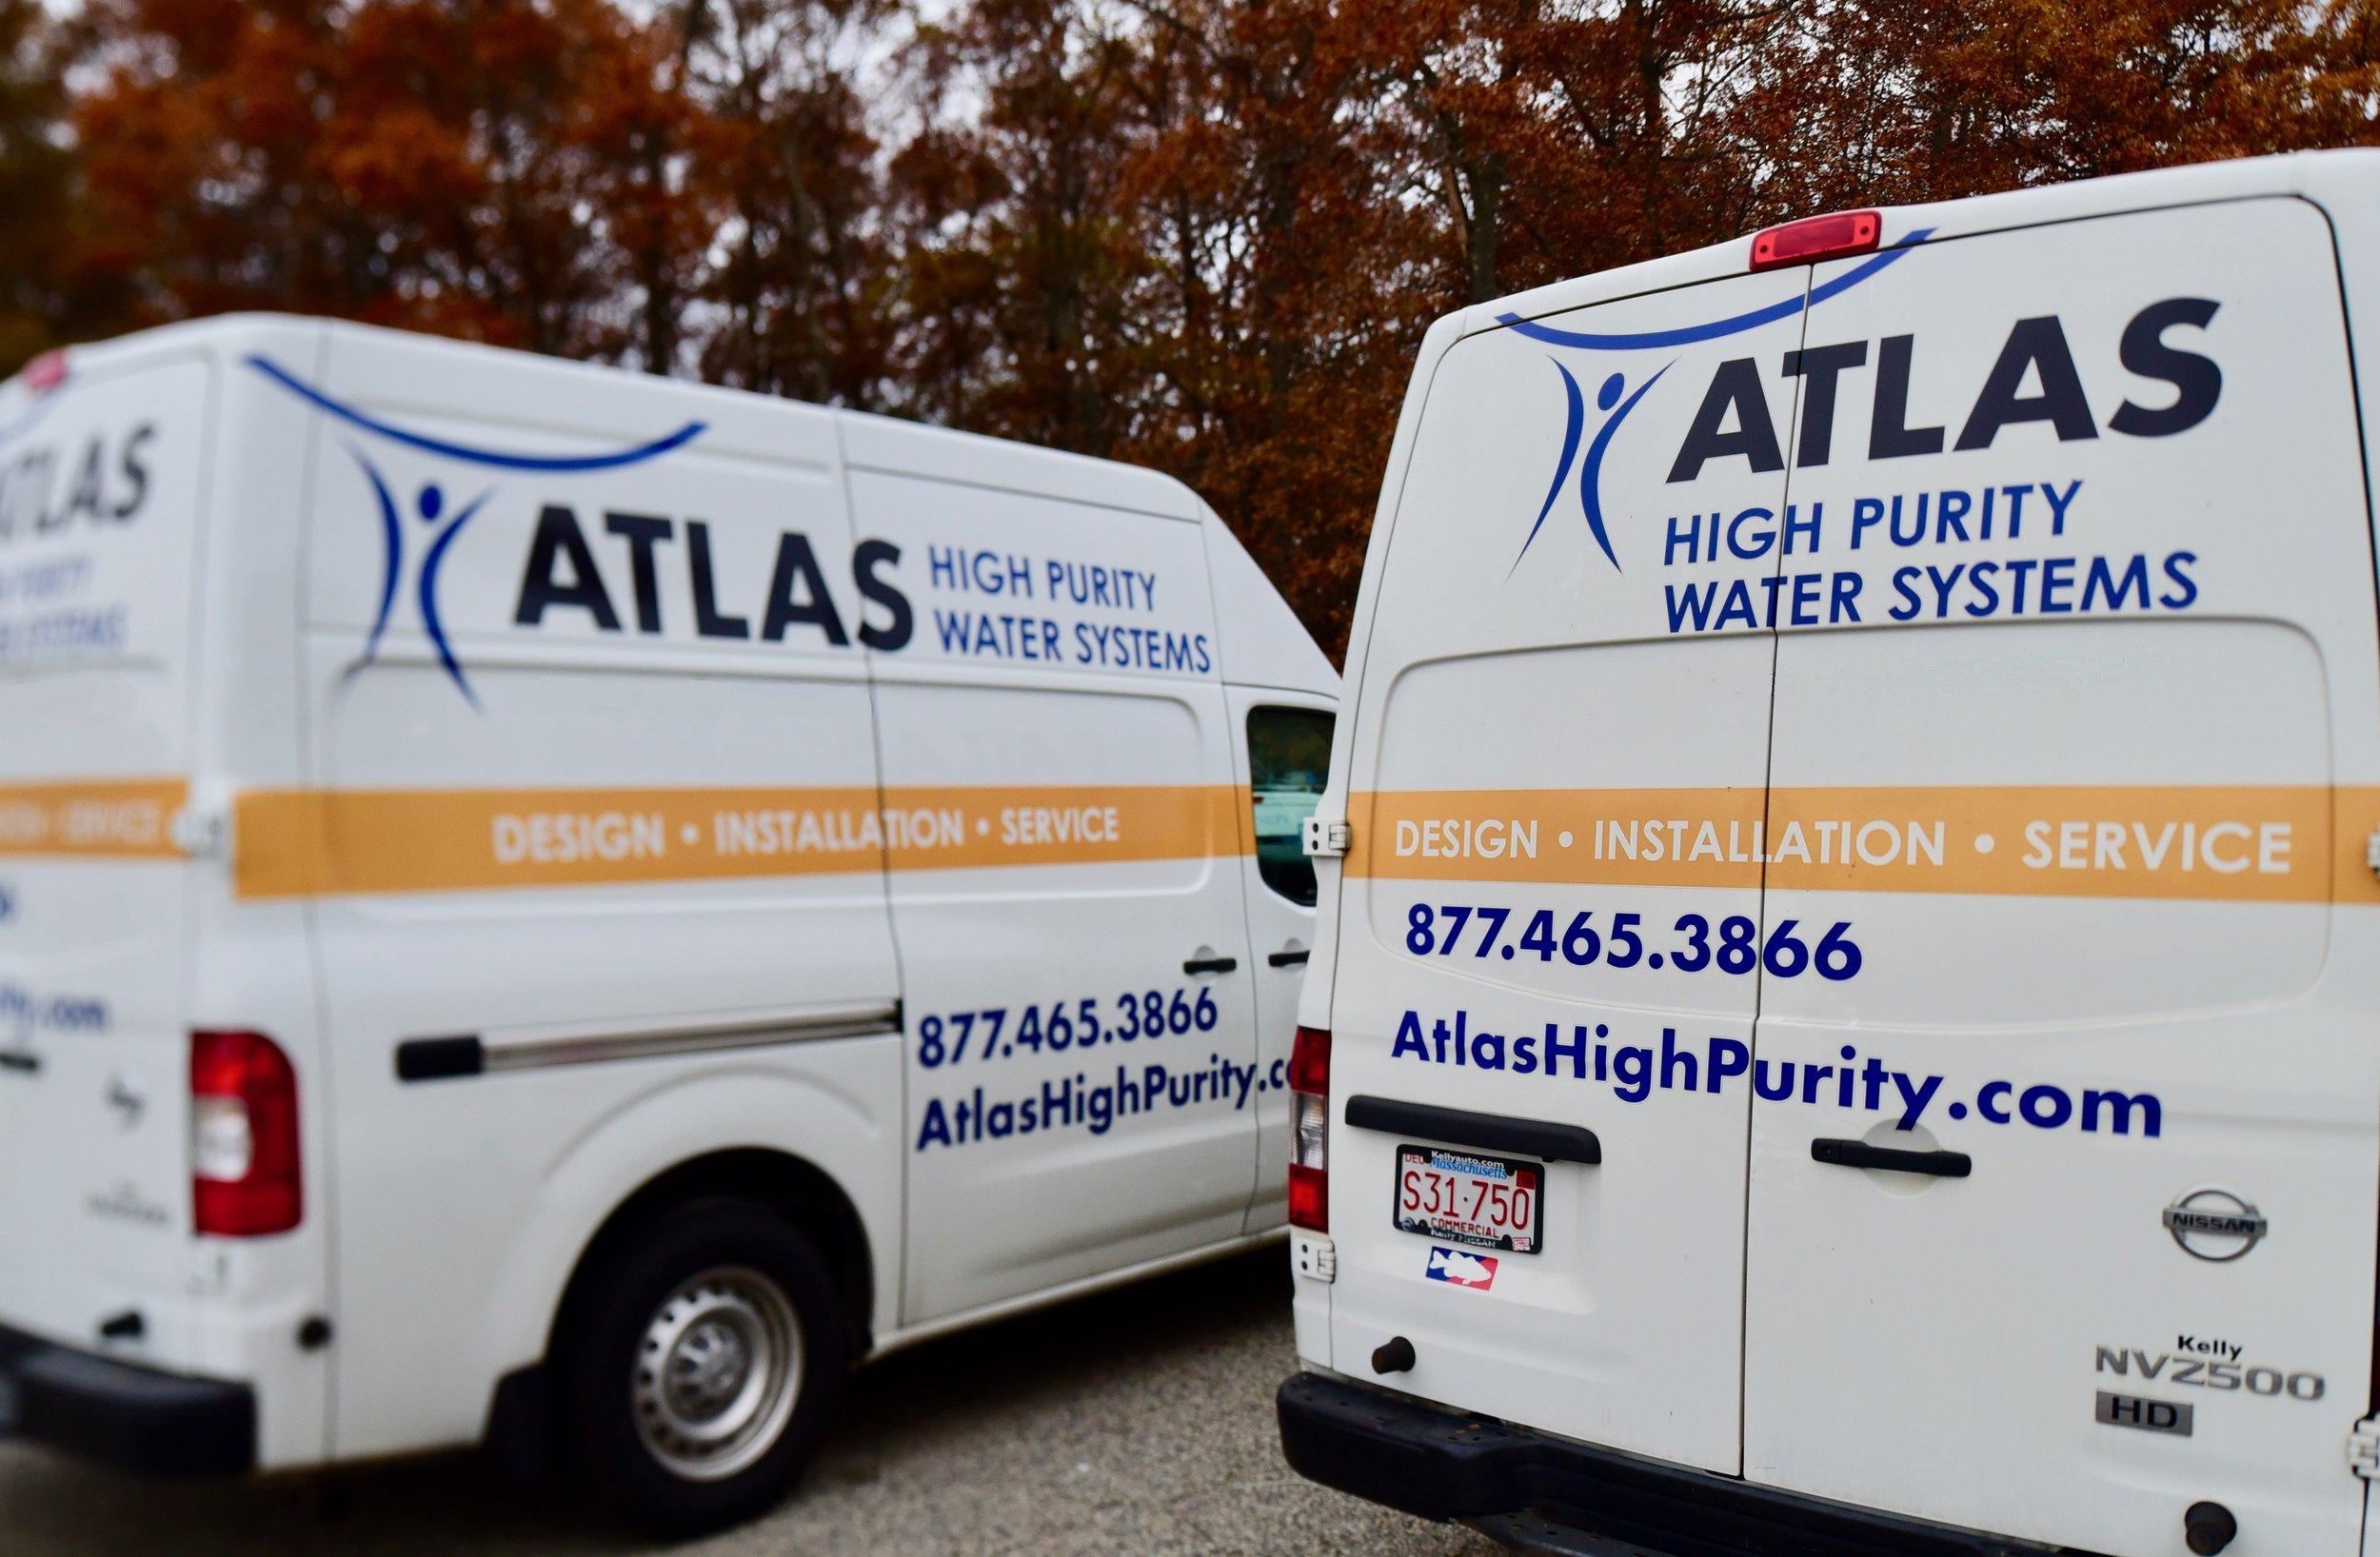 Atlas RODI service